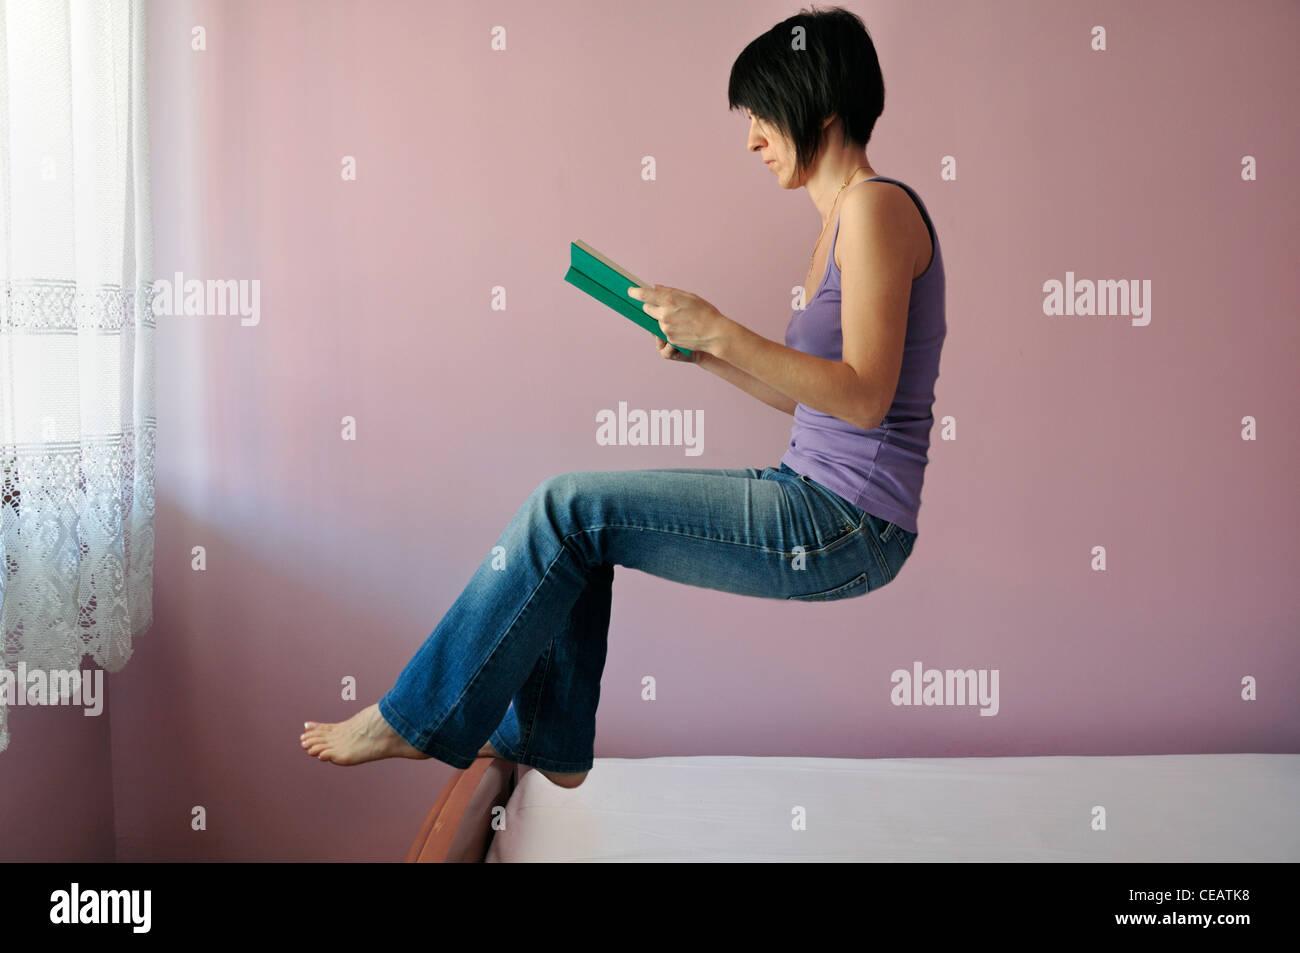 Mujer libro de lectura flotante Imagen De Stock